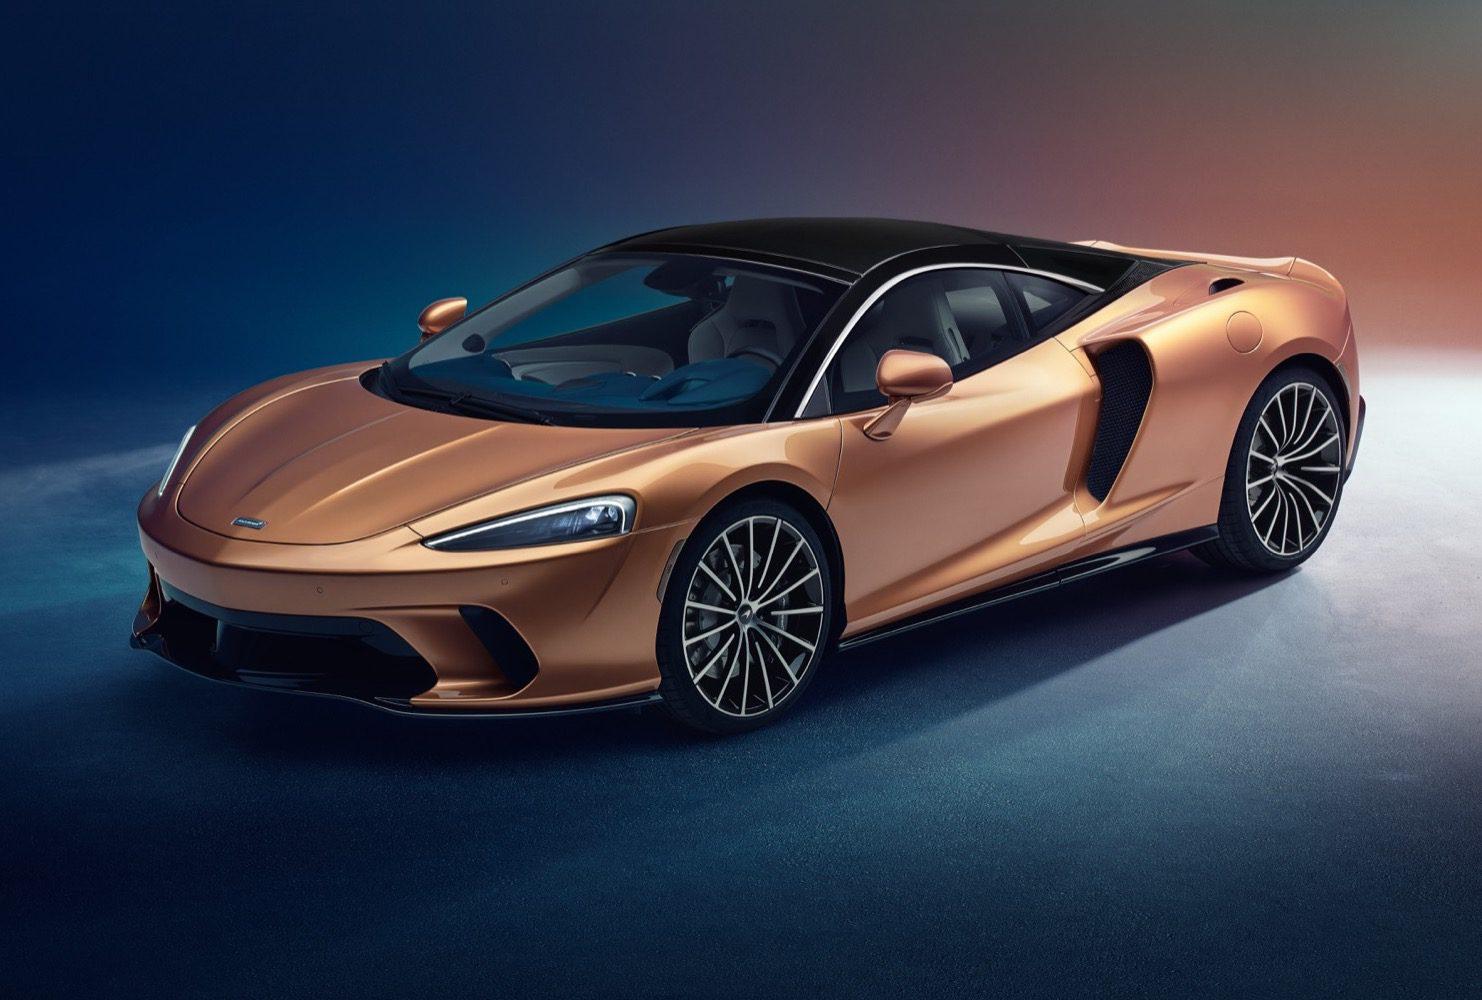 O McLaren GT 2020 é um substituto de 612 cv para seu jato particular